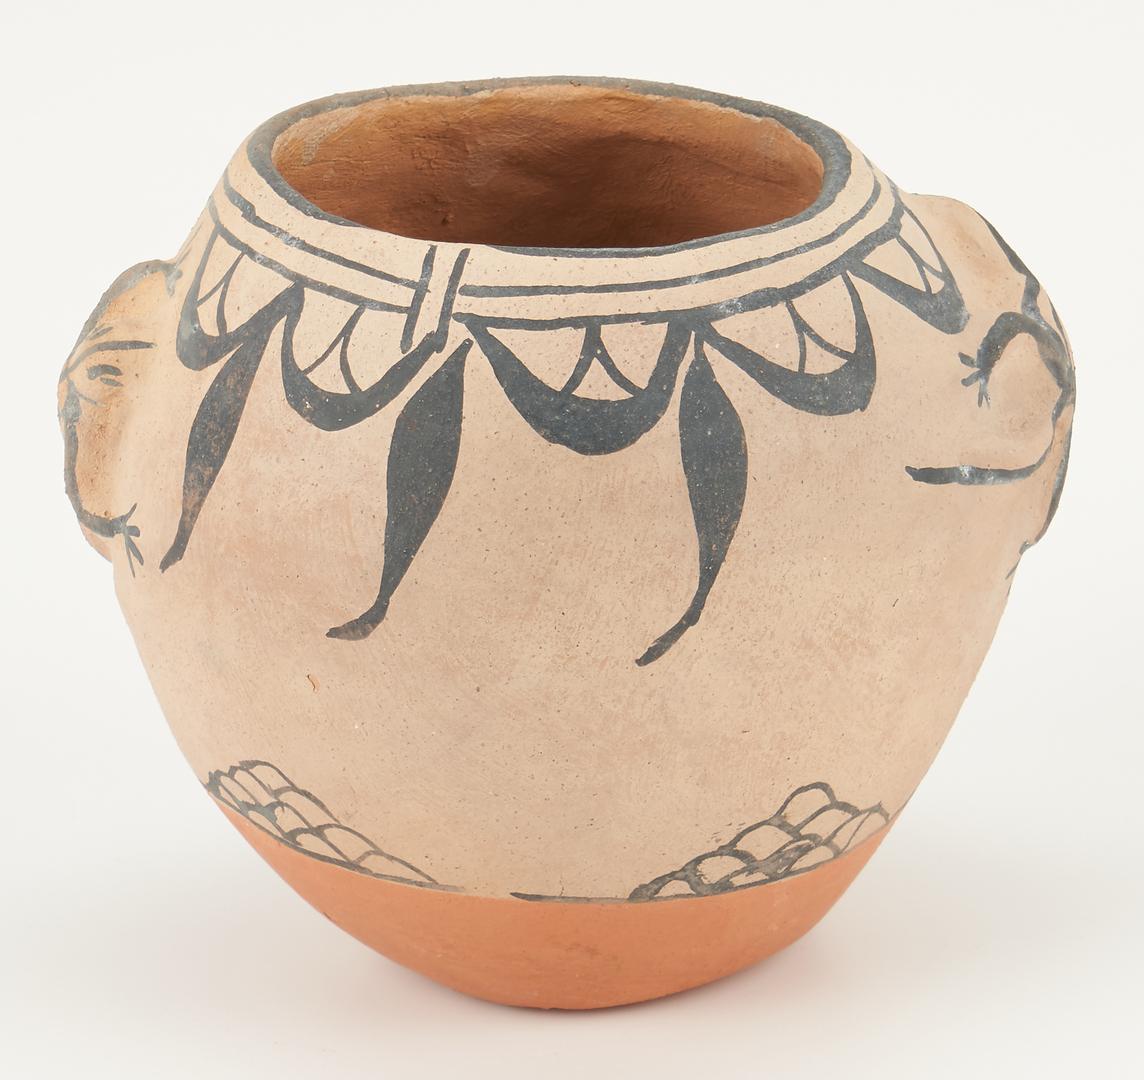 Lot 669: 2 Southwest Native American Pottery Pieces, Gates & Romero